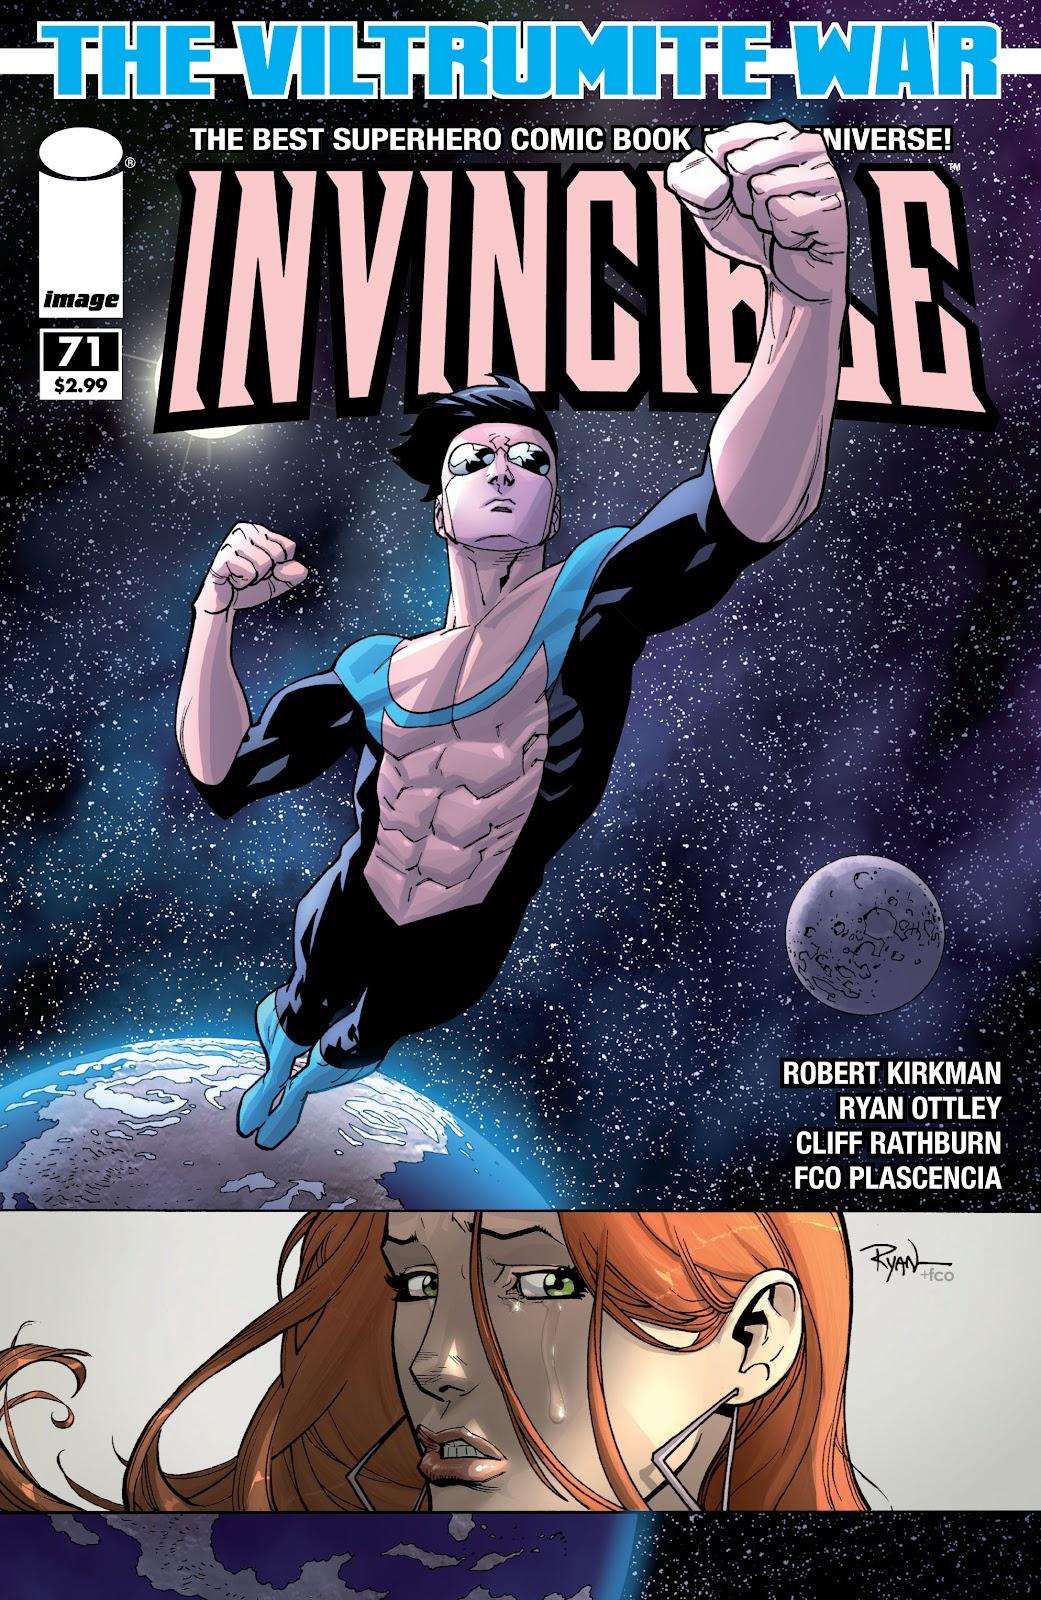 Invincible (2003) 71 Page 1